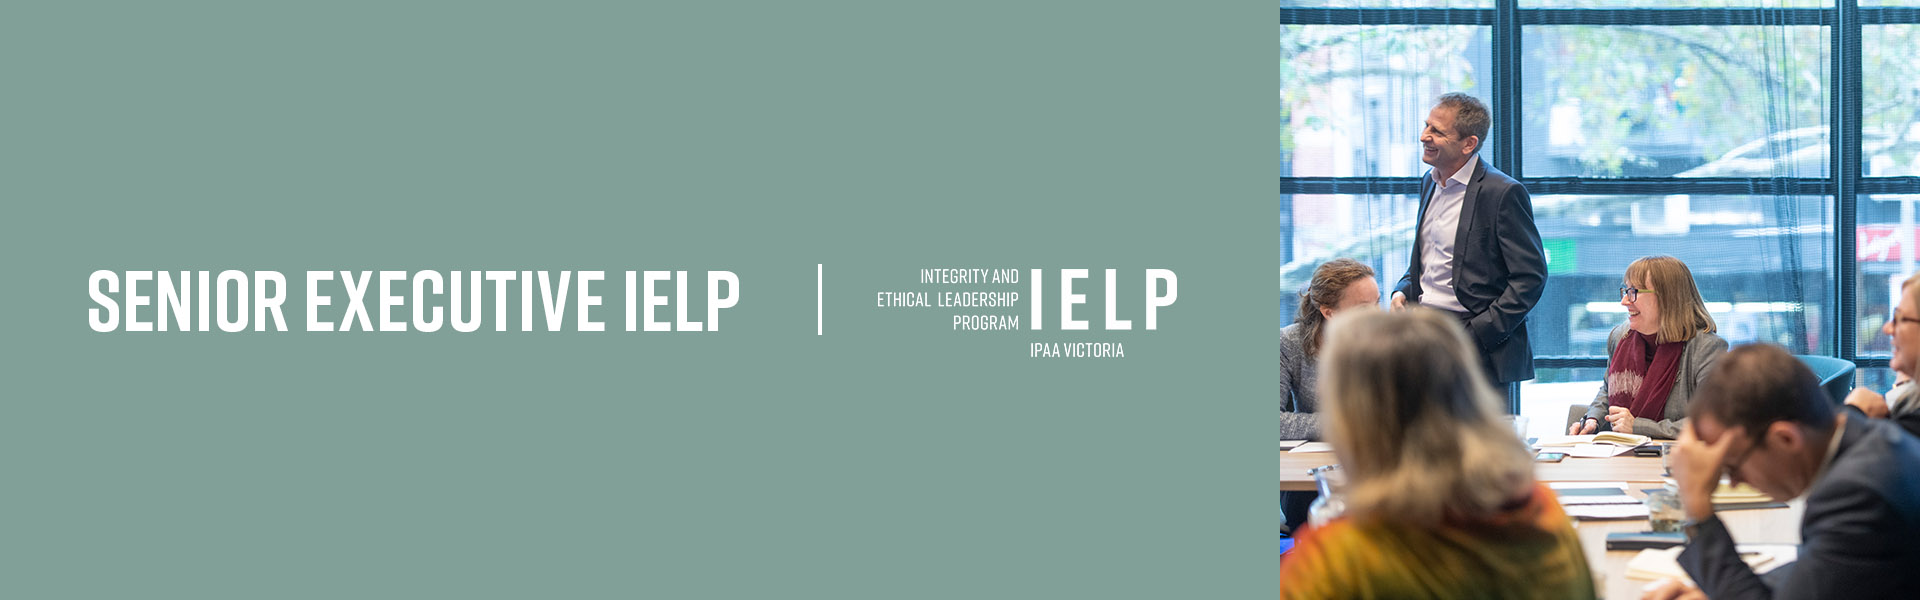 IELP_Web Banner_Image_1_1920x600.jpg